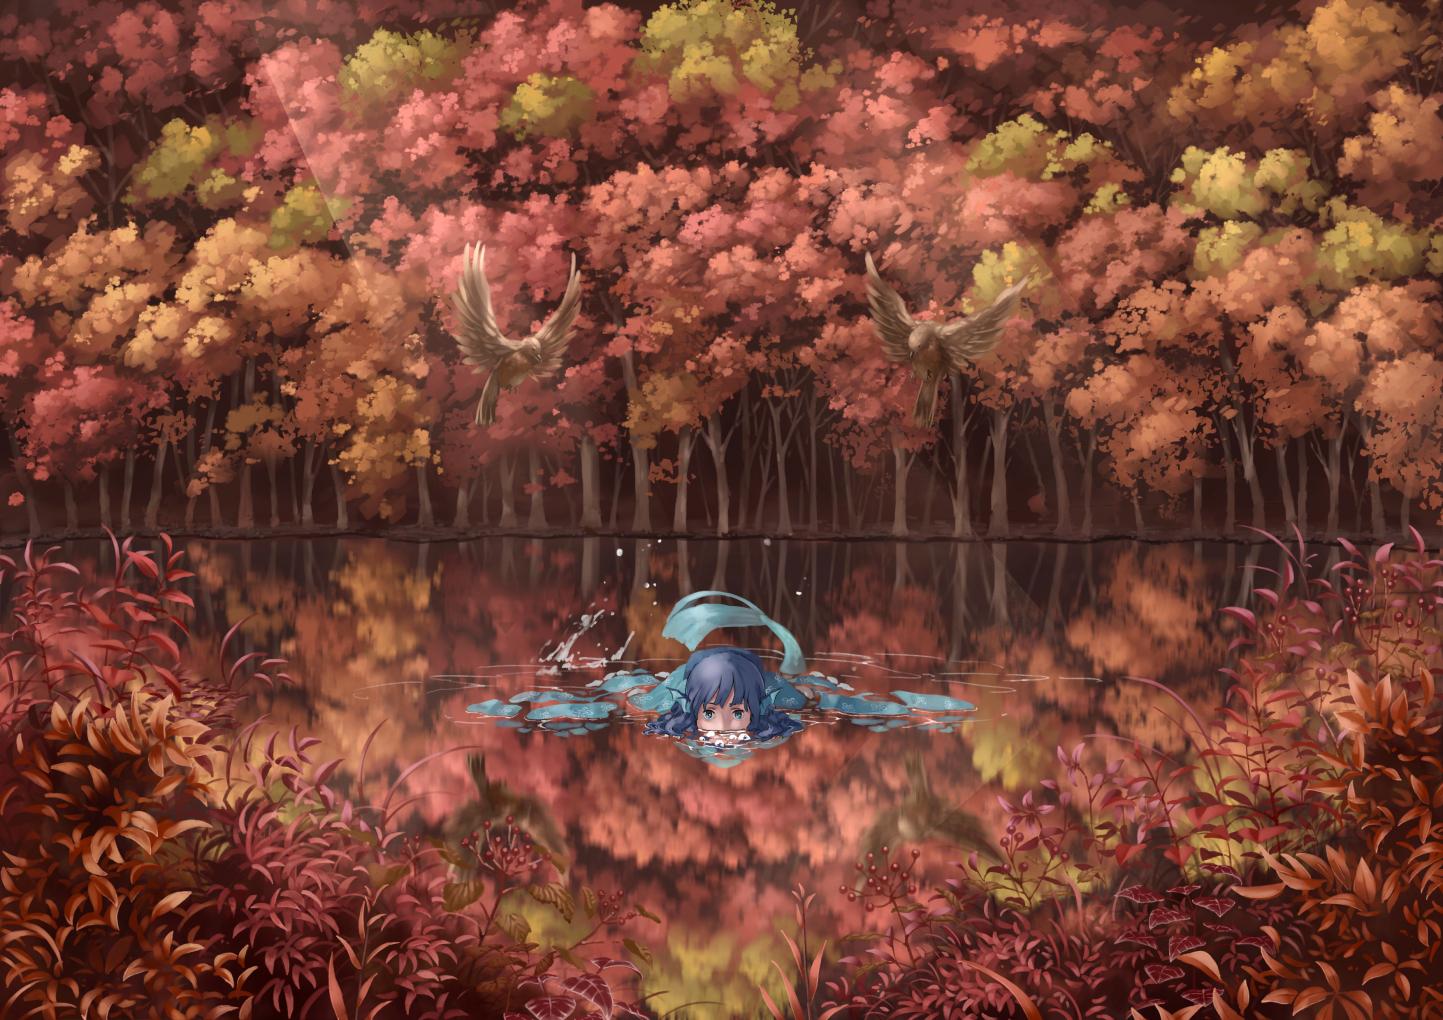 animal autumn bird blue_hair forest green_eyes mermaid nagi_(xx001122) reflection touhou tree wakasagihime water